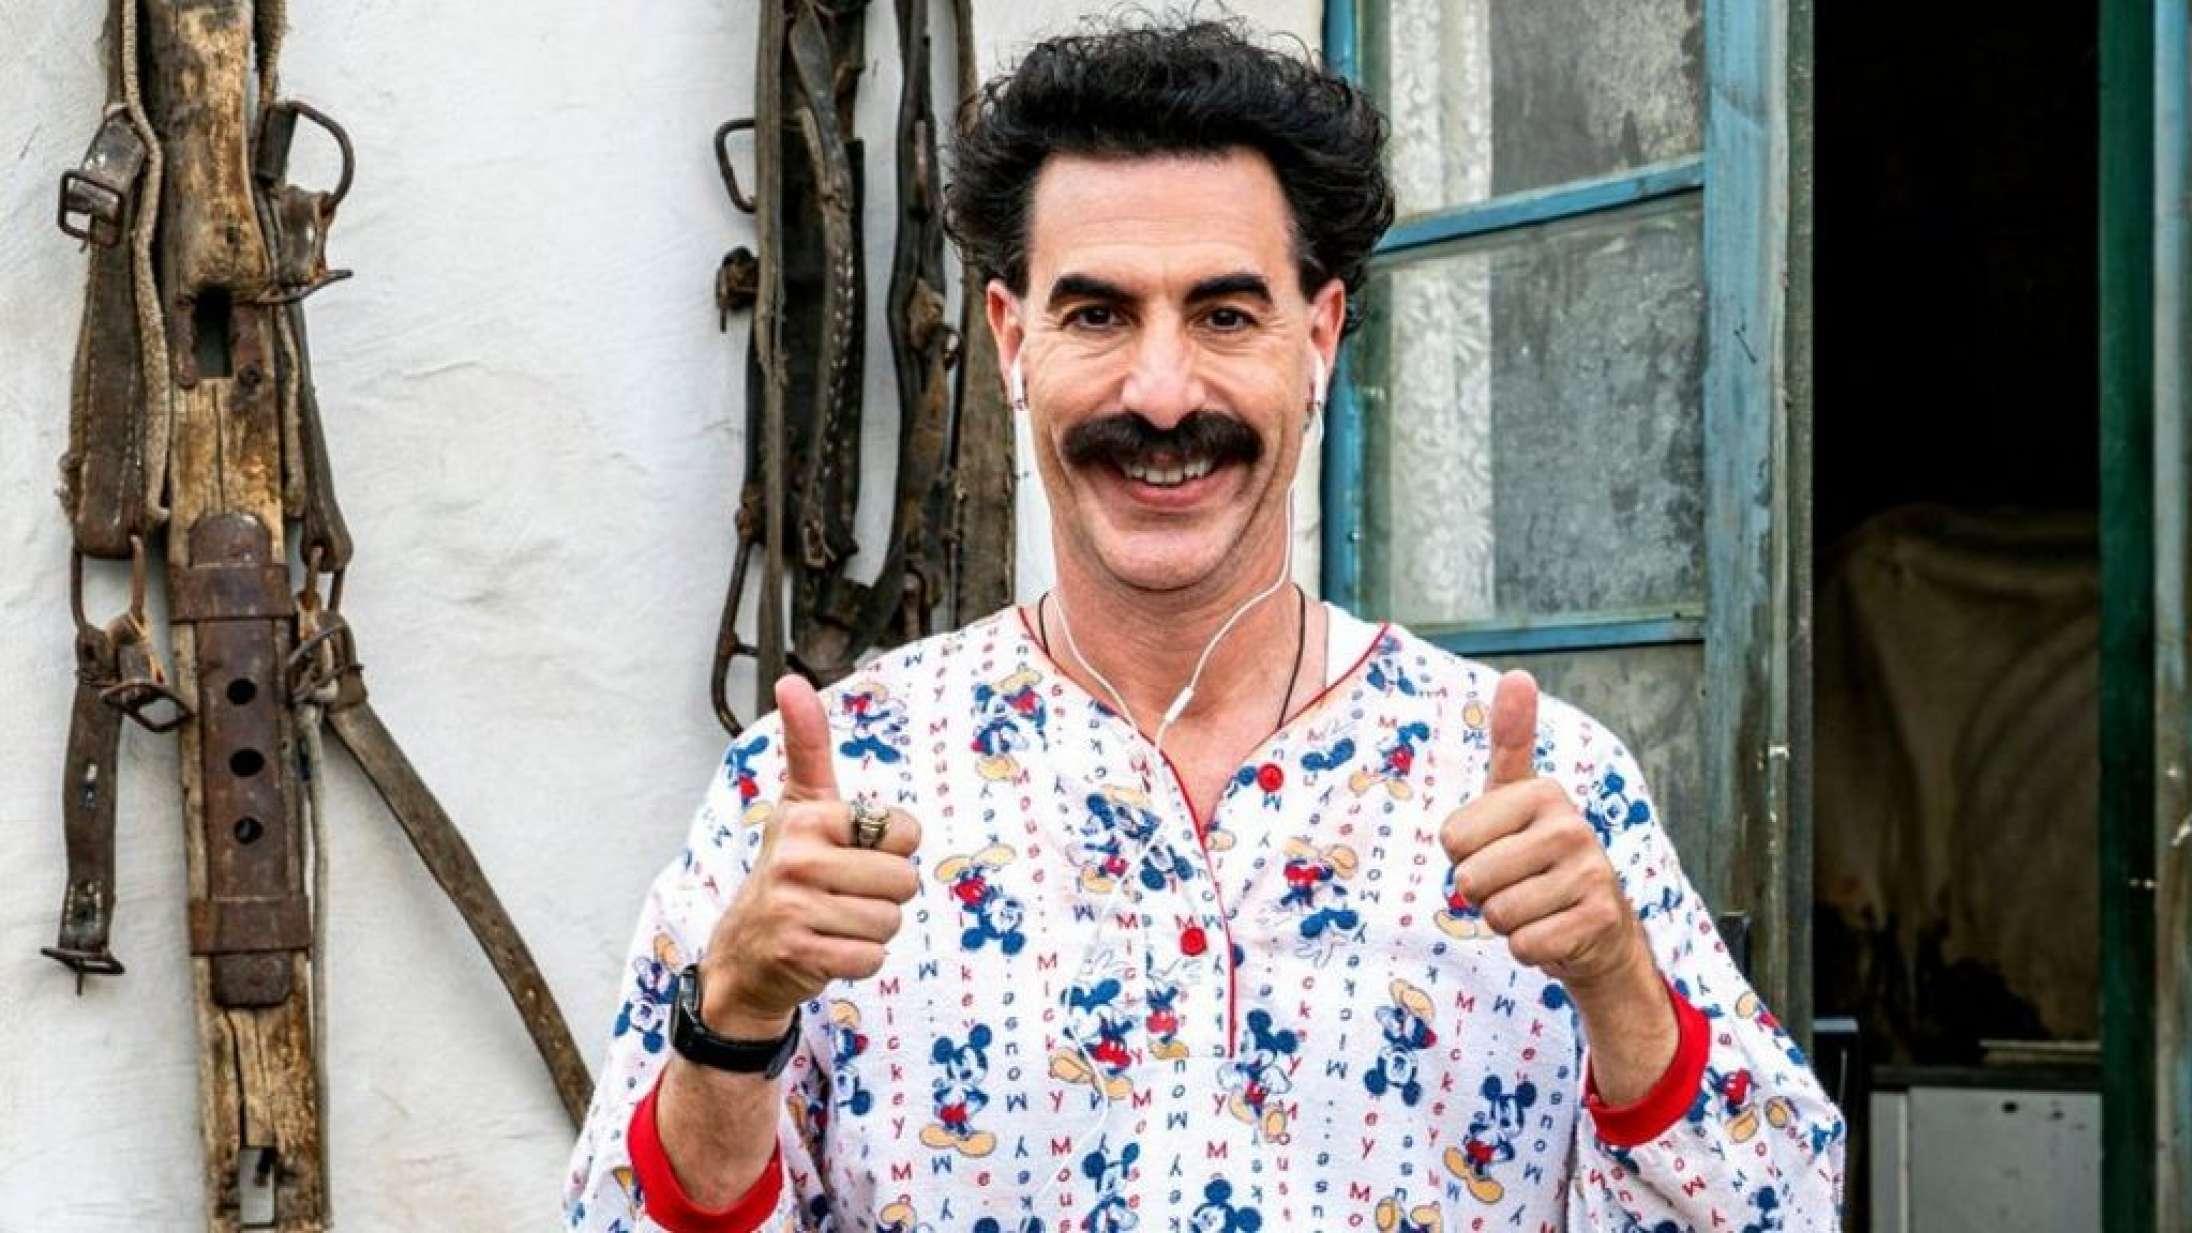 Én scene i den nye 'Borat'-film fik det til at løbe iskoldt ned ad ryggen på mig